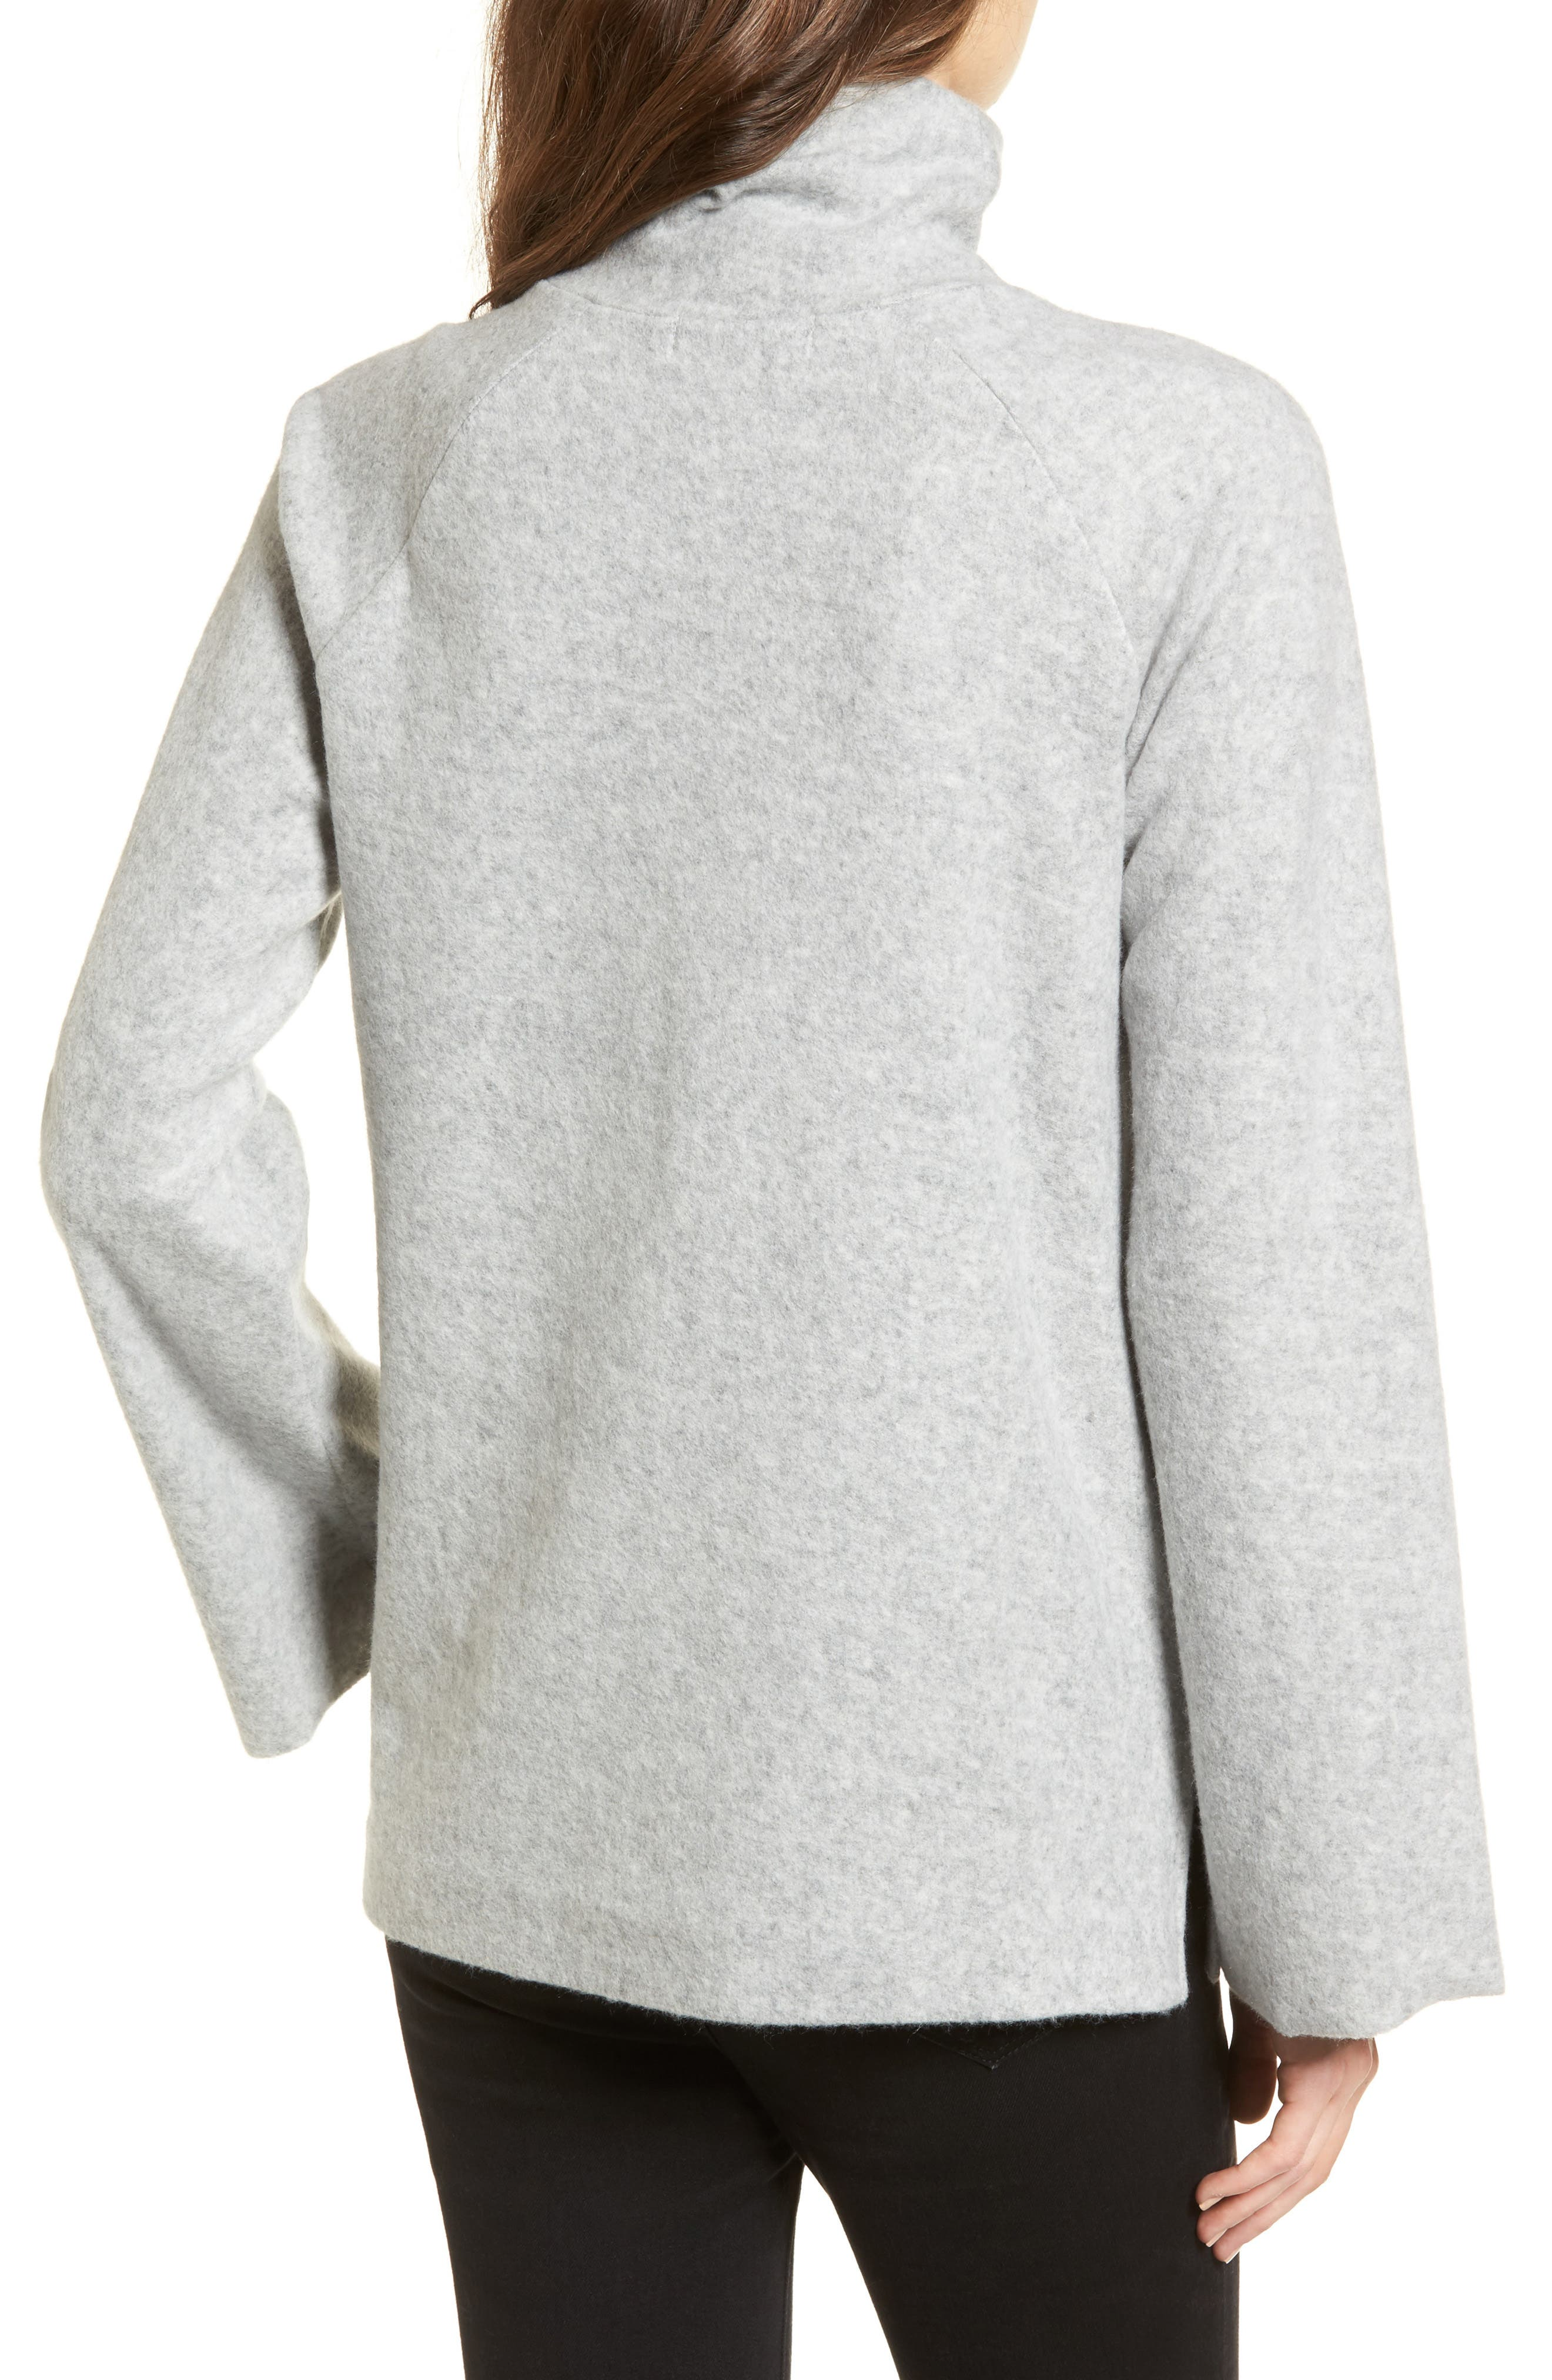 Bell Sleeve Sweatshirt,                             Alternate thumbnail 2, color,                             Grey Heather